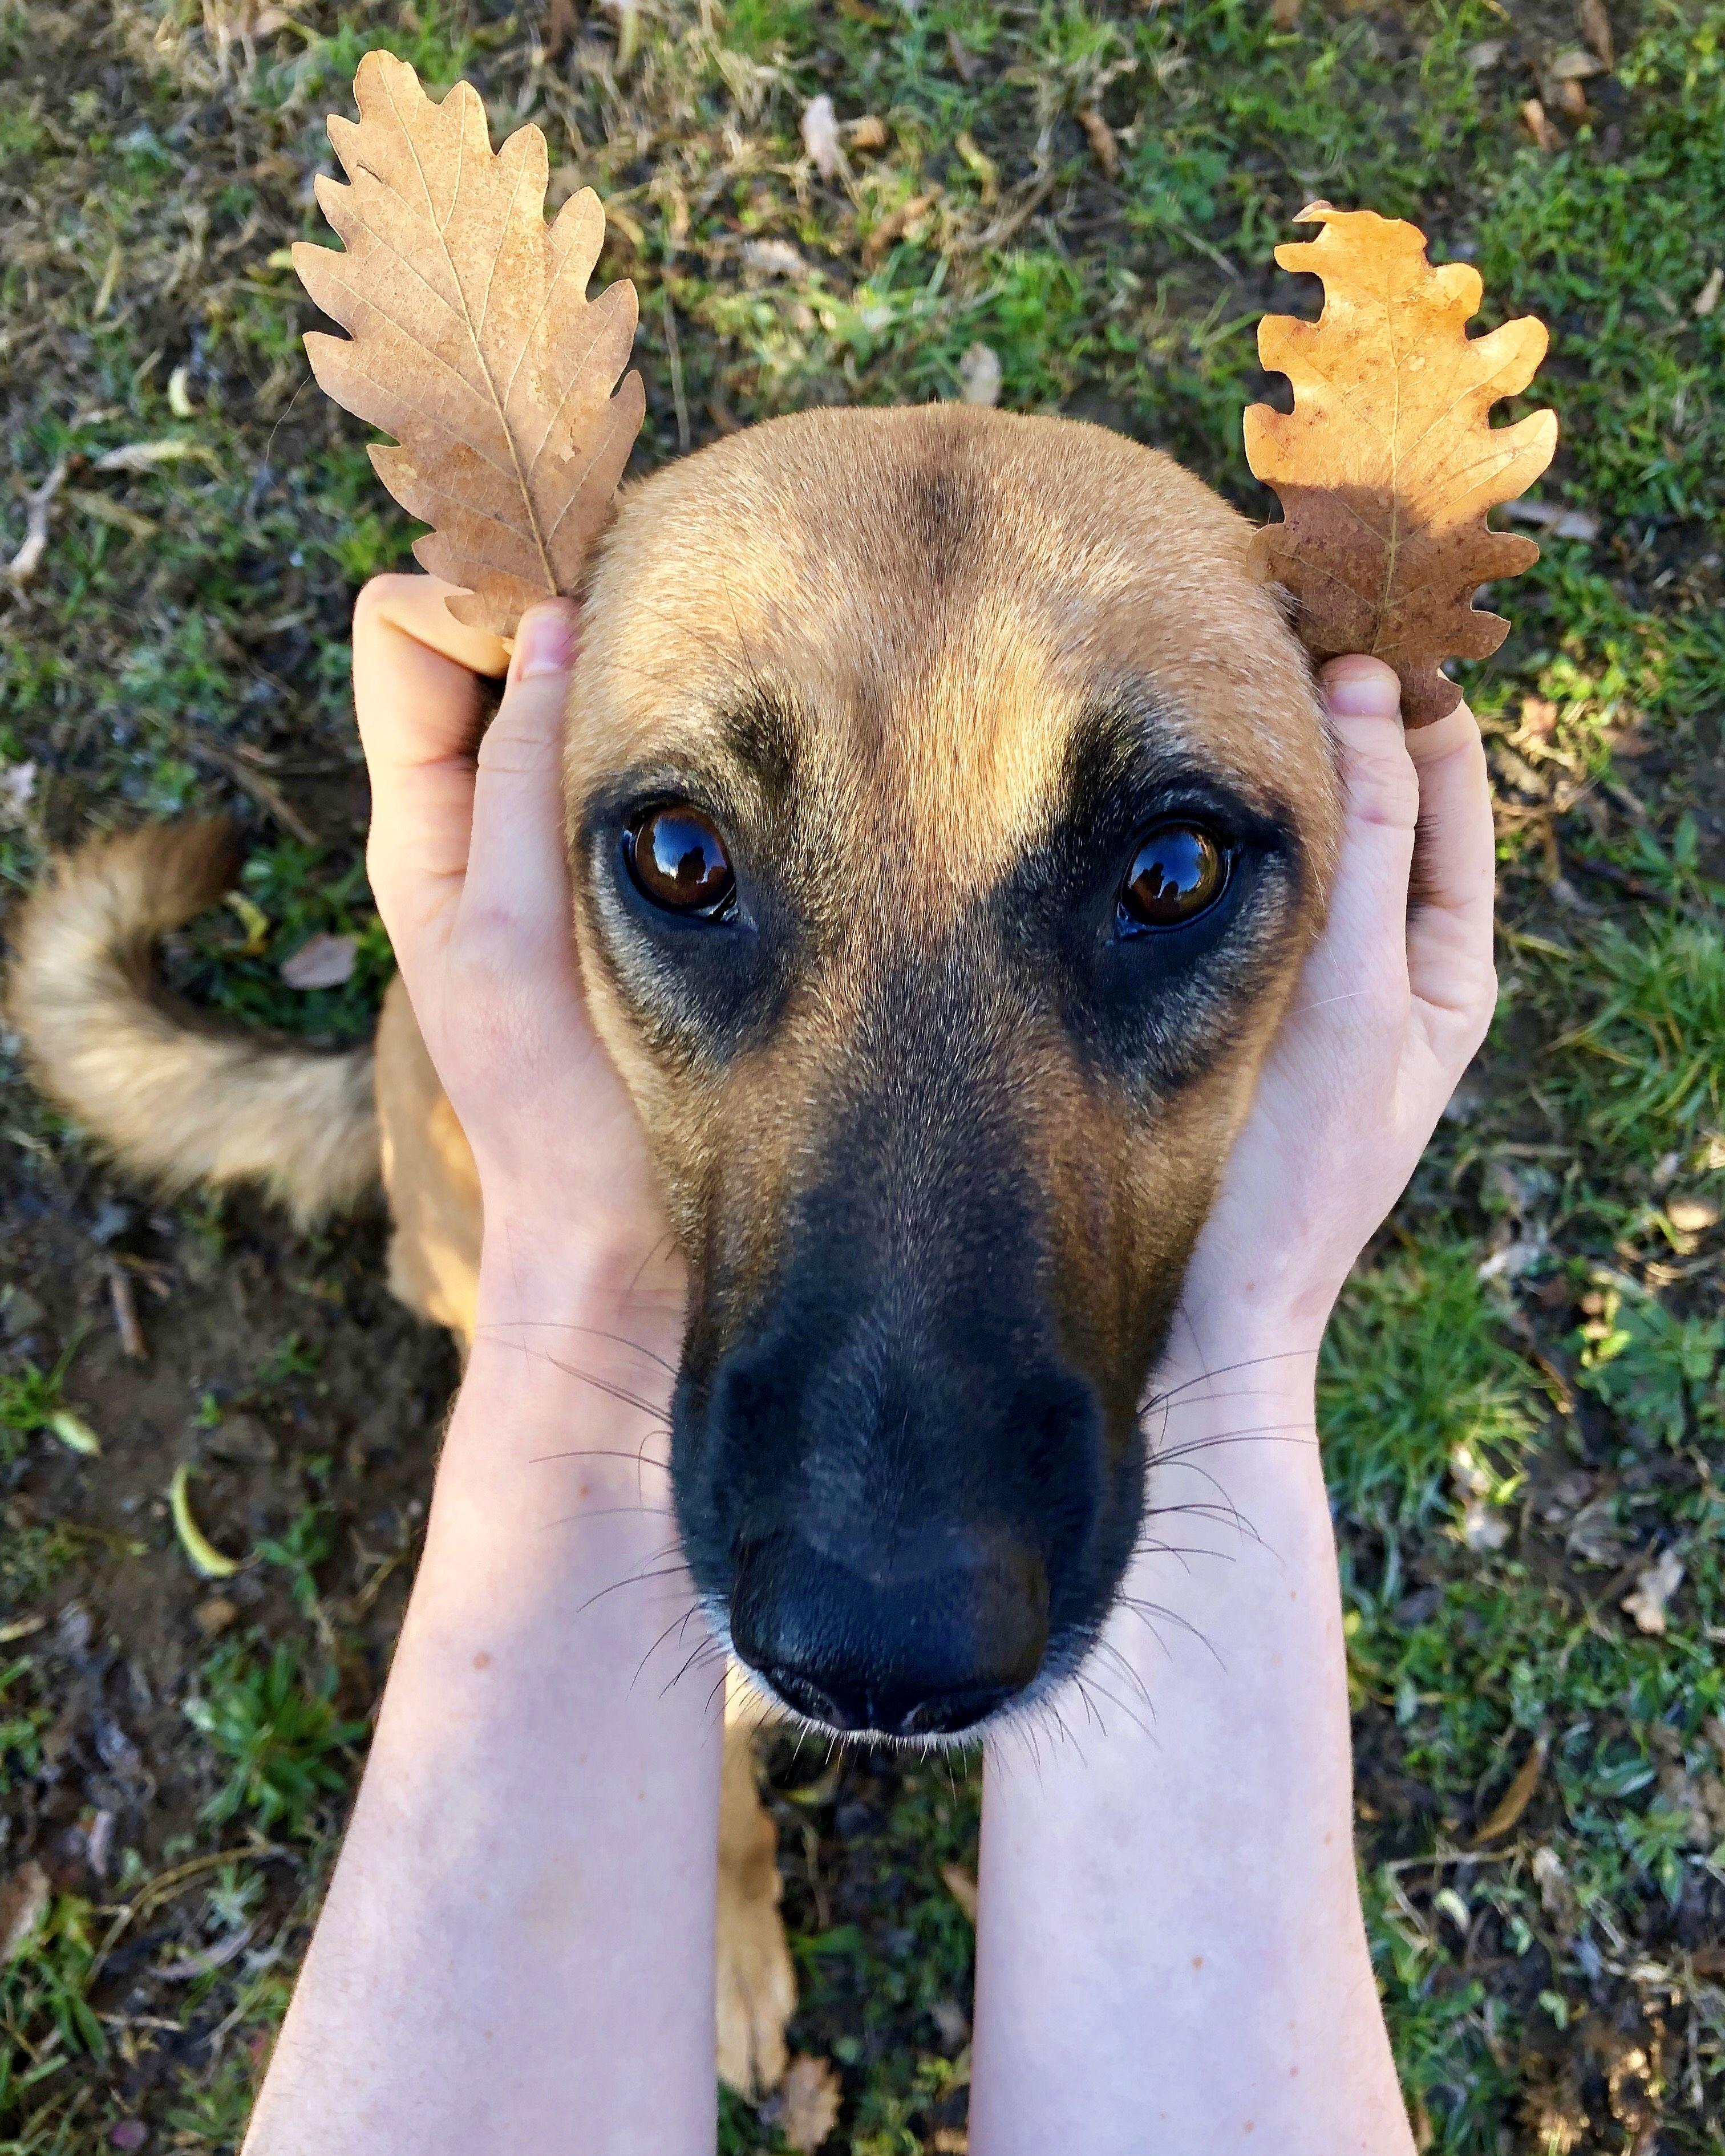 diesel-chien-concours-photo-animaux-octobre-2019